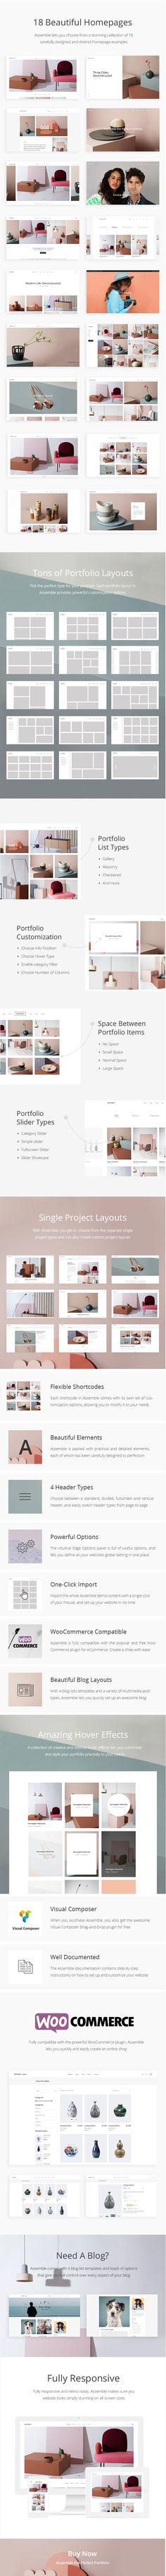 Assemble - A Contemporary Portfolio Theme #blog #clean #design • Download ➝ https://themeforest.net/item/assemble-a-contemporary-portfolio-theme/16966325?ref=pxcr